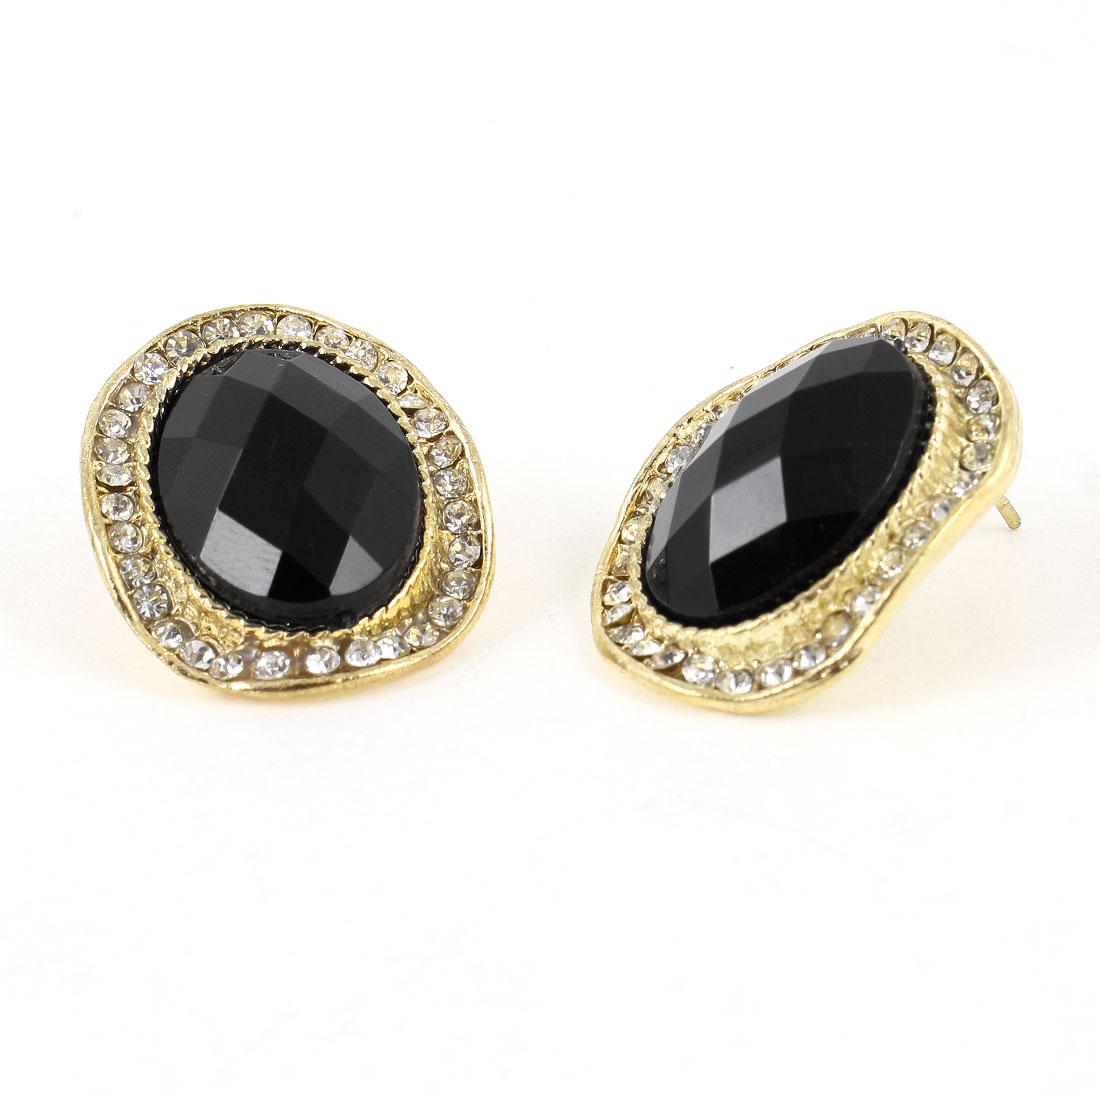 Pair Rhinestones Faceted Bead Decor Stud Earrings Gold Tone Black for Ladies